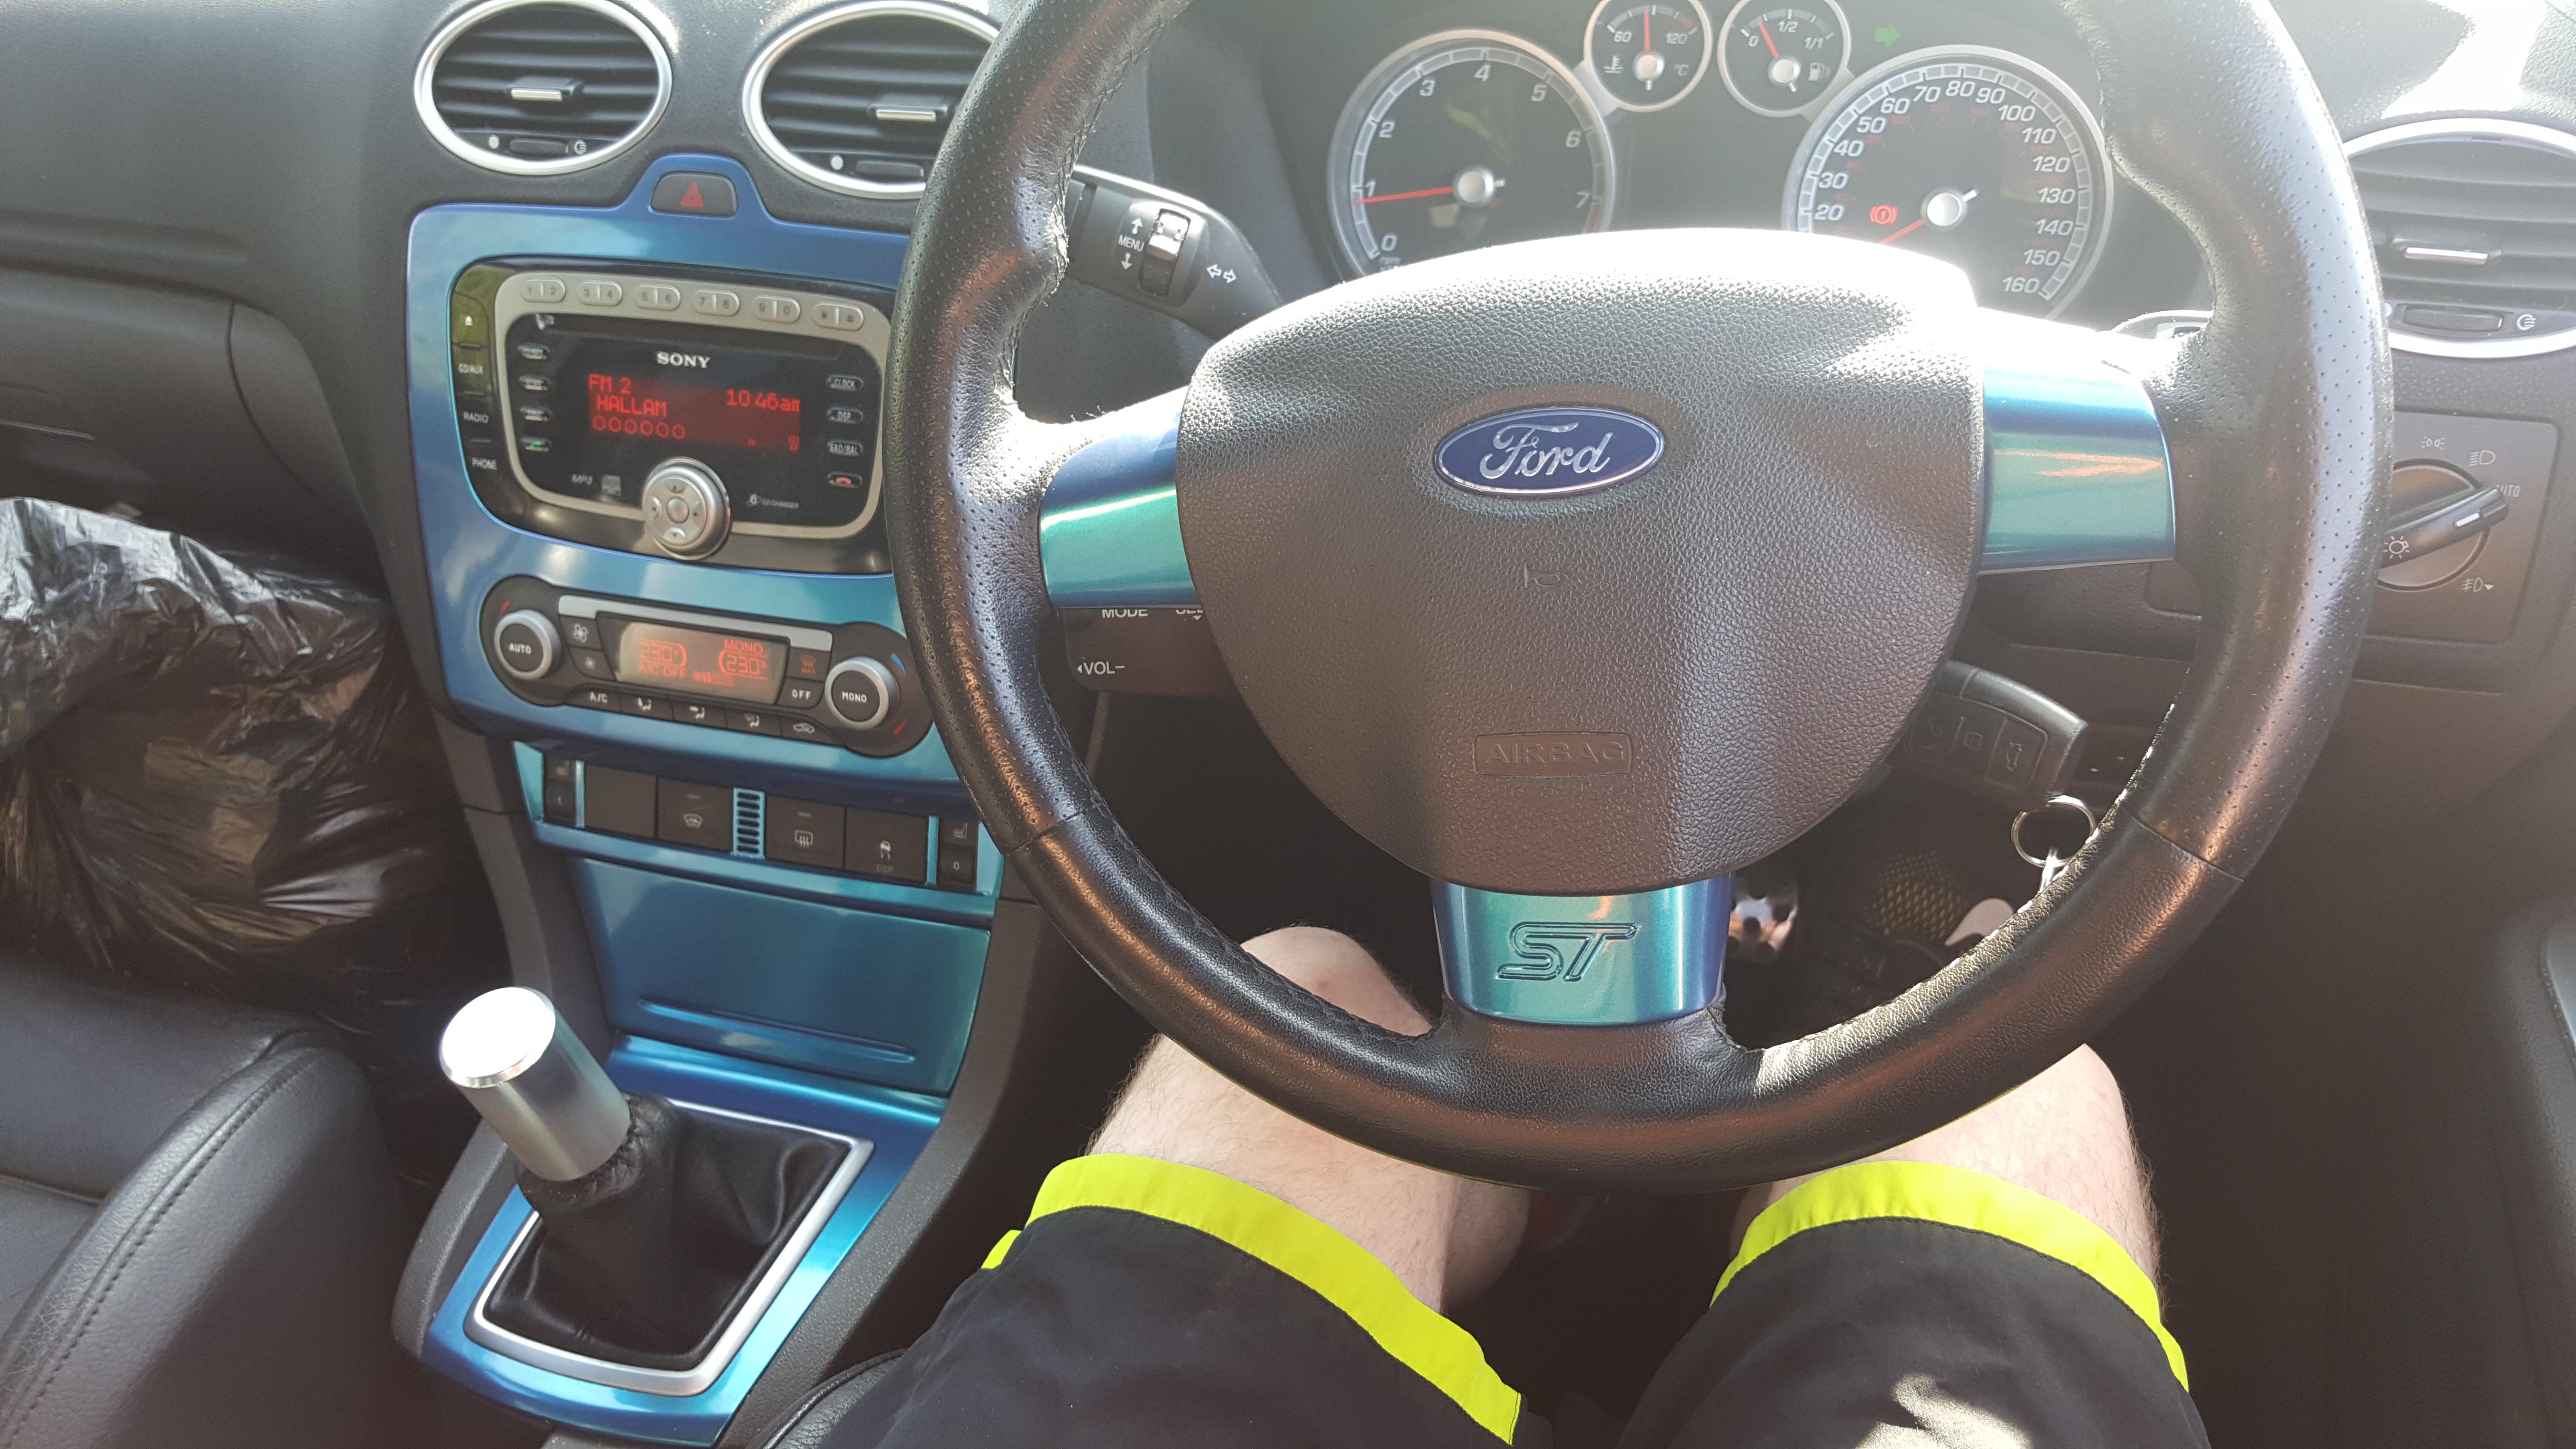 Ford Focus ST MK2 Interior Wrap